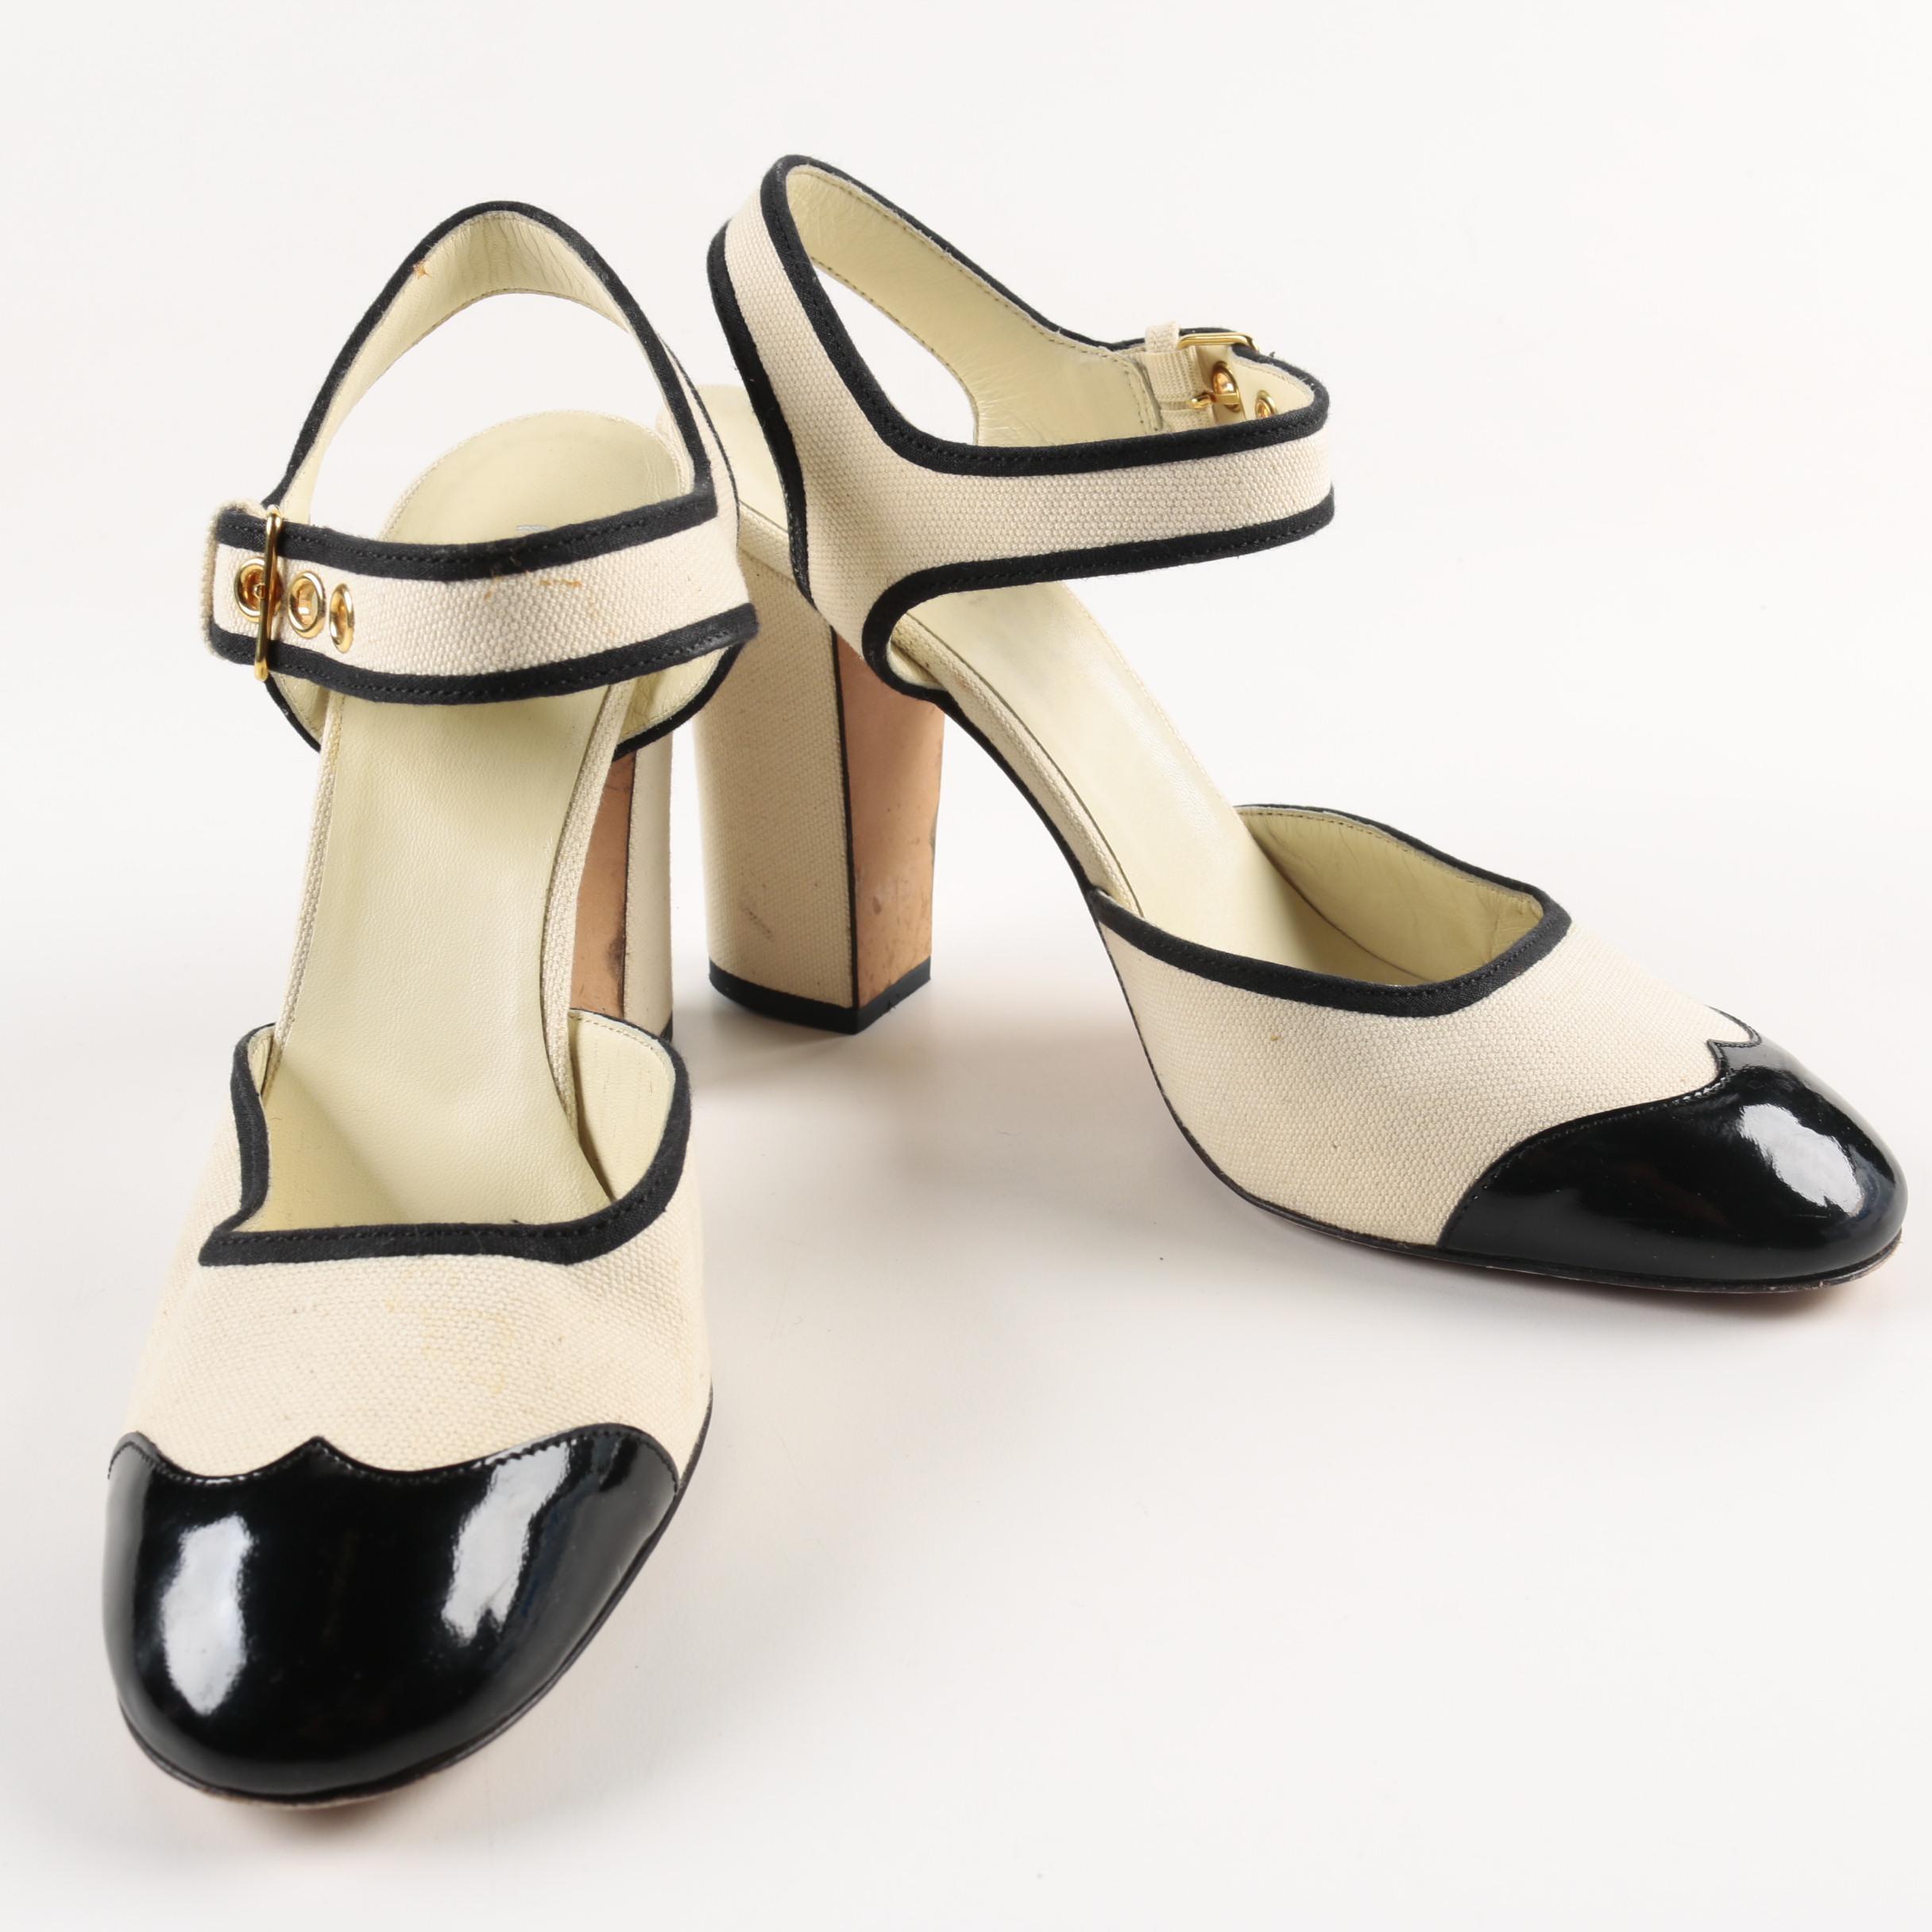 Miu Miu Spectator Style Heels